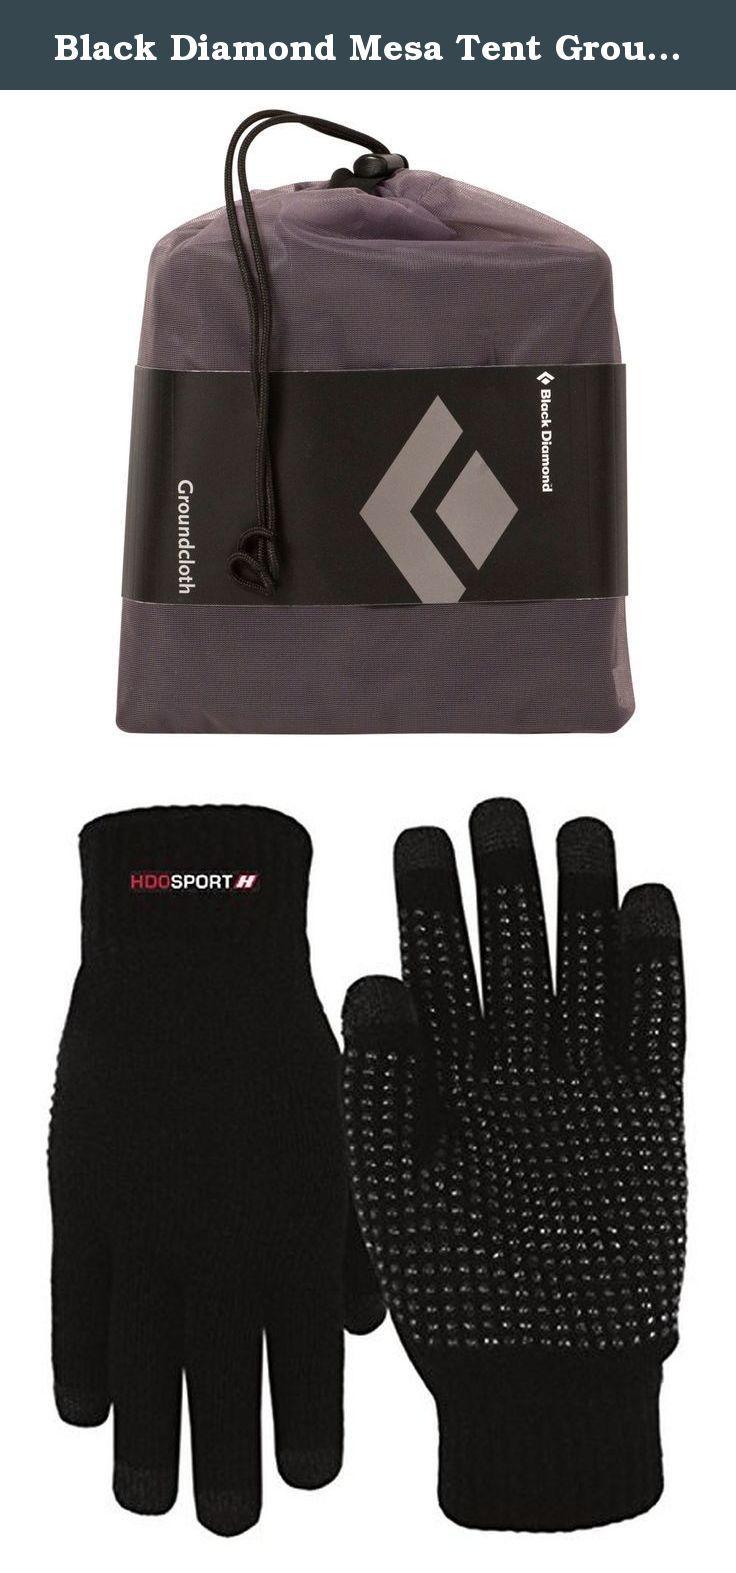 Black diamond virago gloves - Black Diamond Mesa Tent Ground Cloth And Hdo Lite E Tip Gloves With Grippers